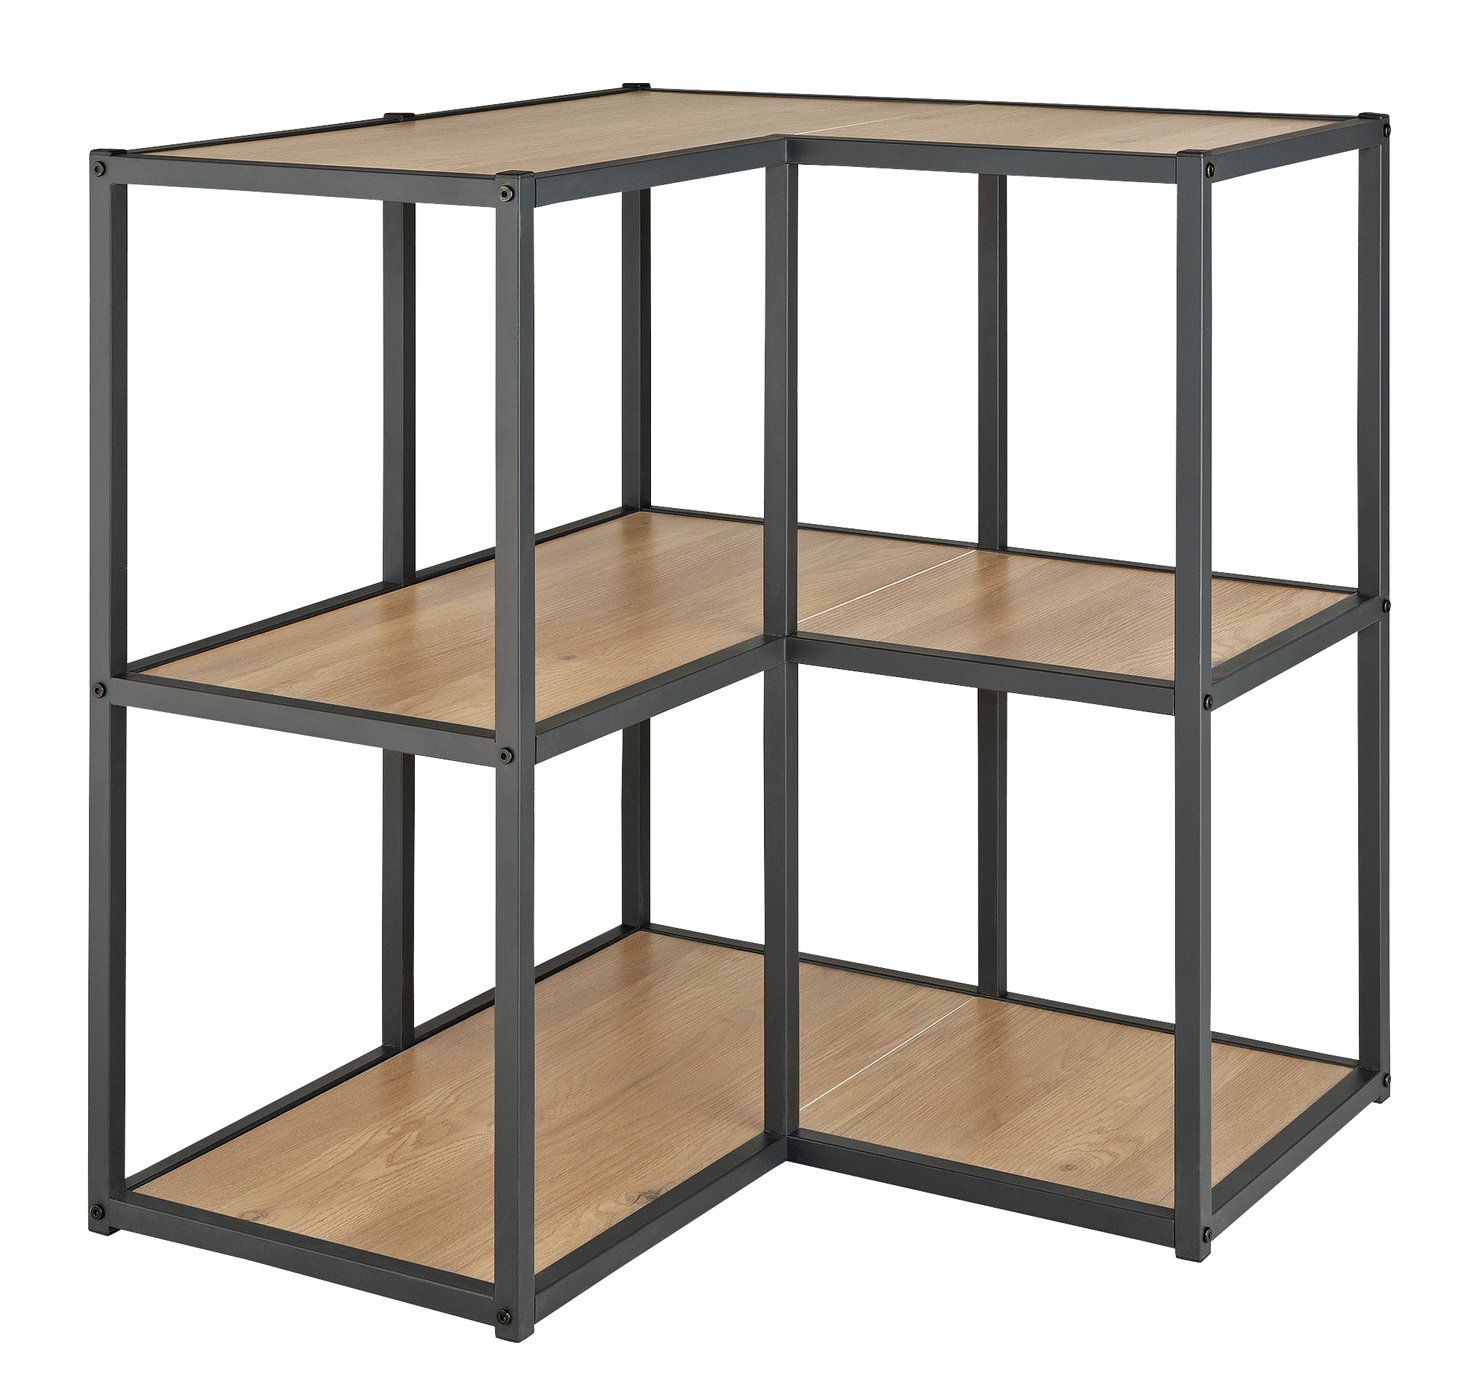 Habitat Loft Living 3 x 2 Corner Storage Unit